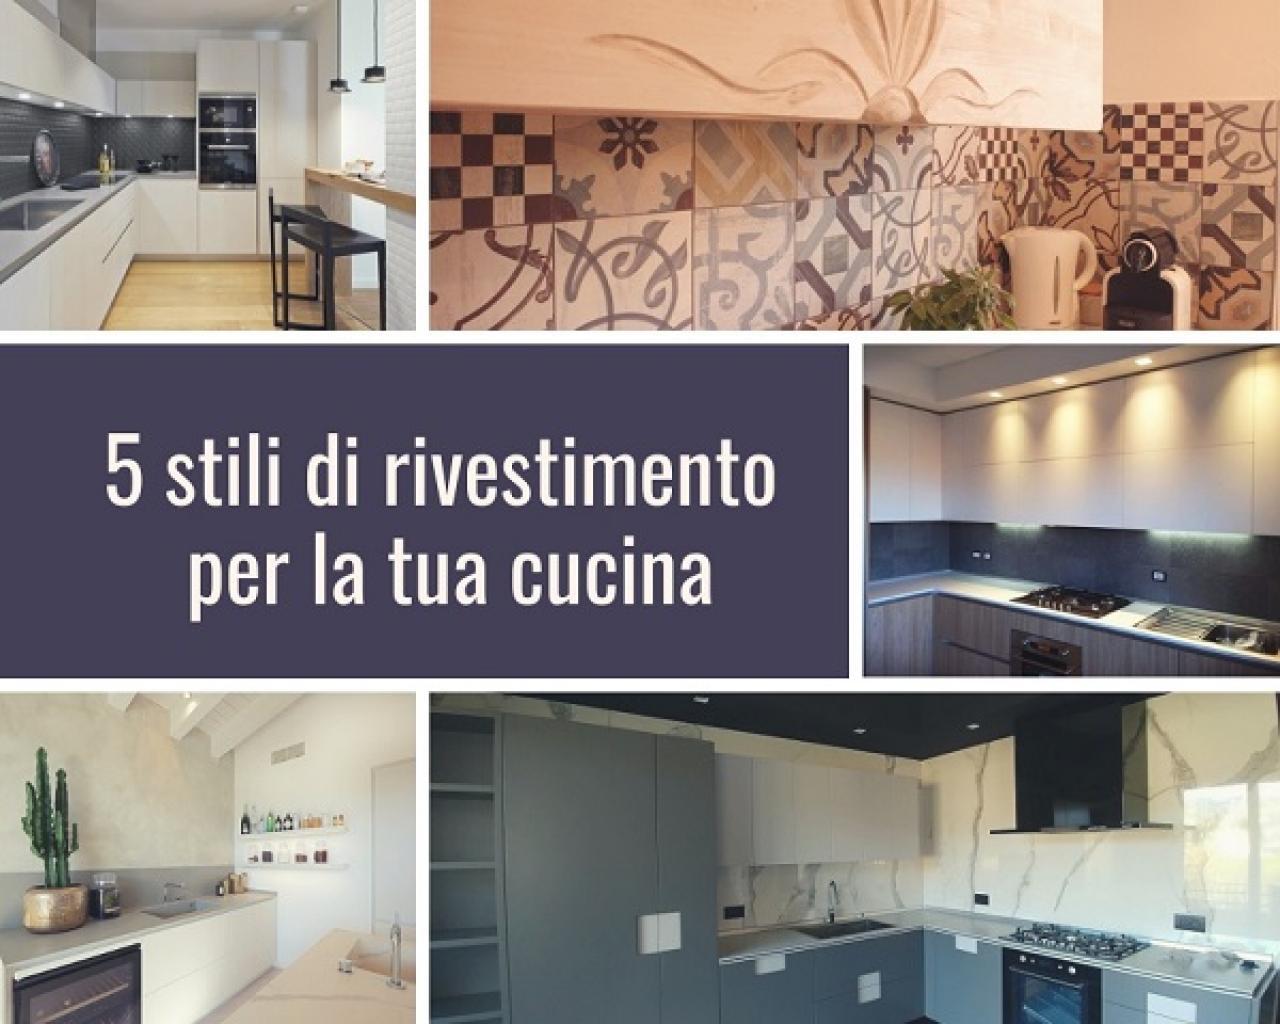 Rivestimento cucina vintage design solution contract furniture